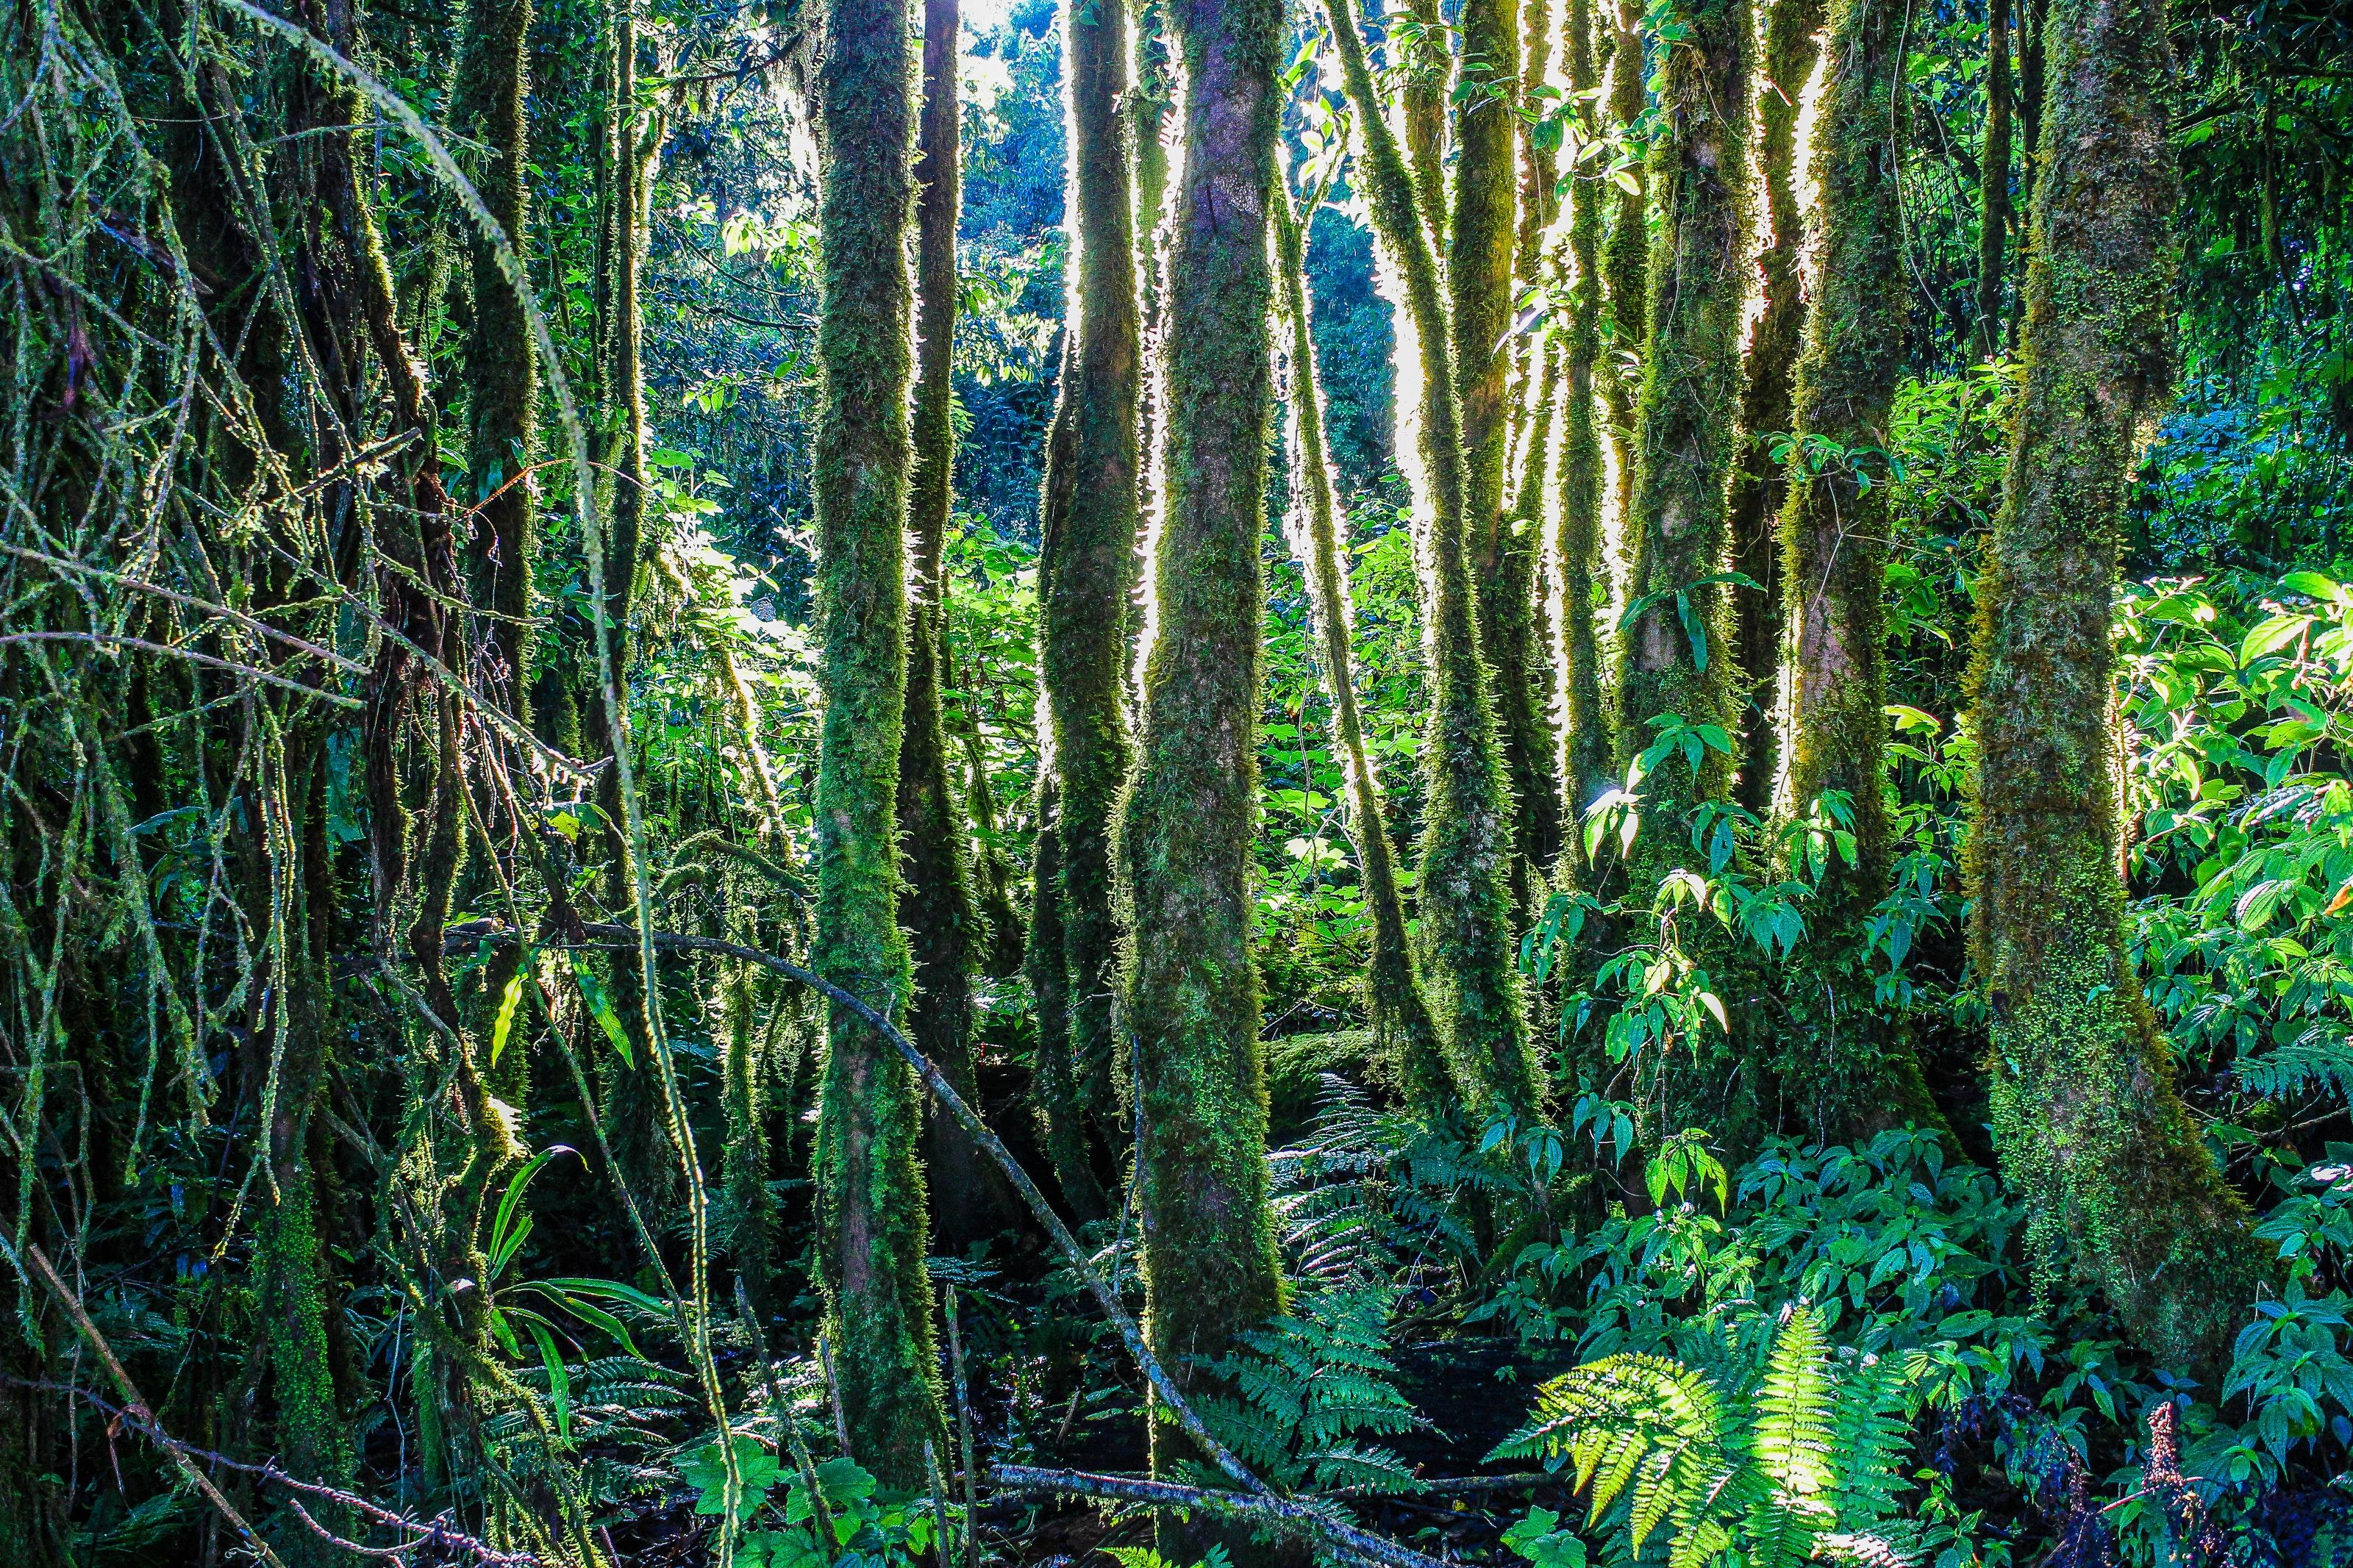 Forest illustration photo